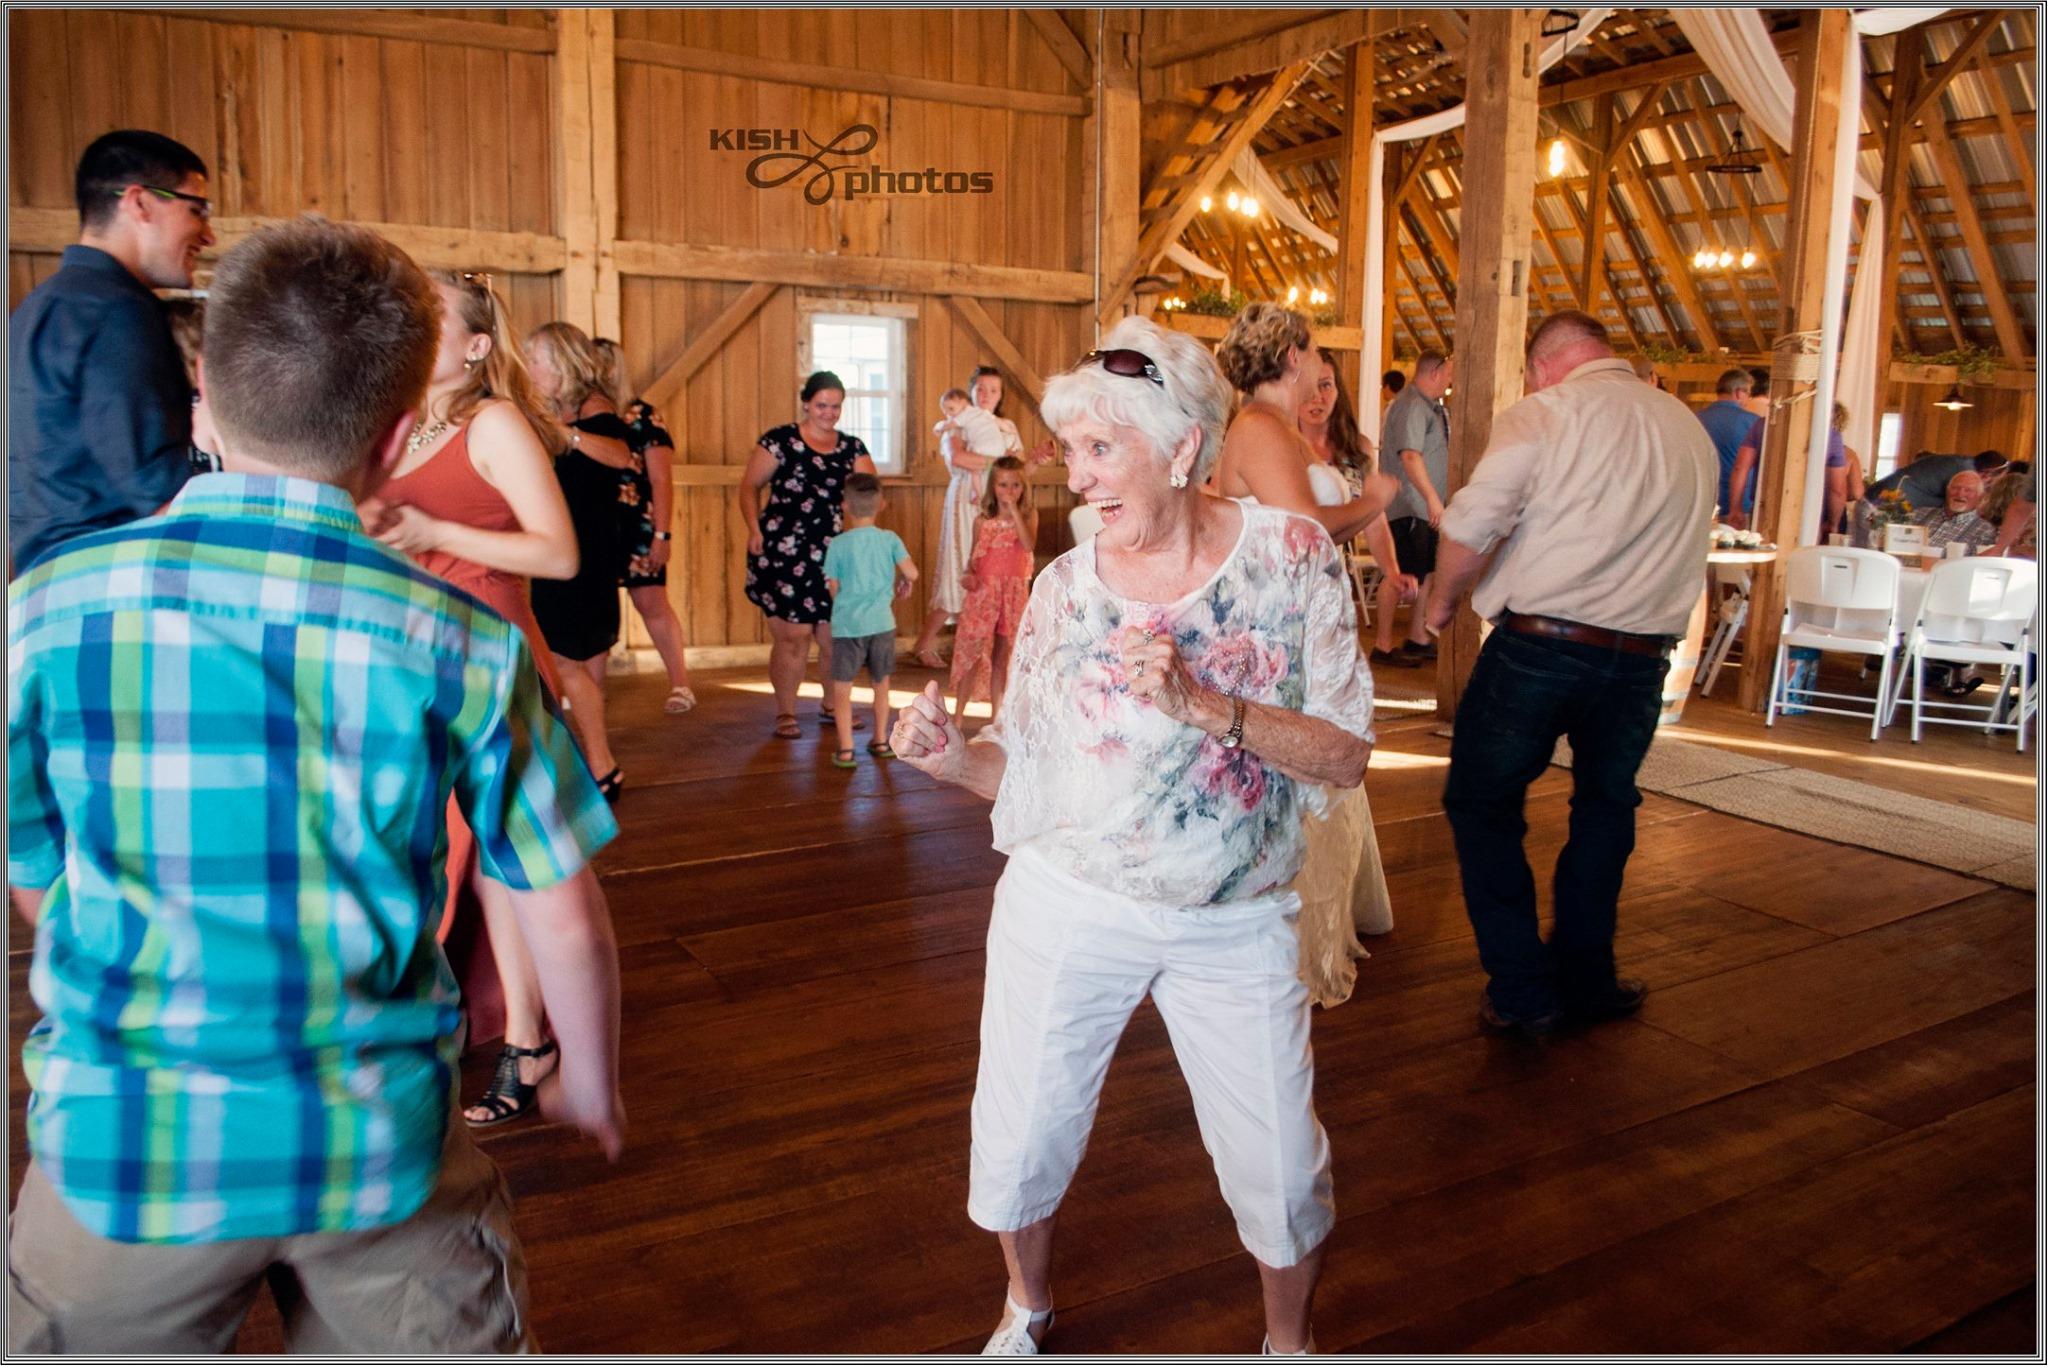 Fun event at Meadow Brook Barn in Goshen